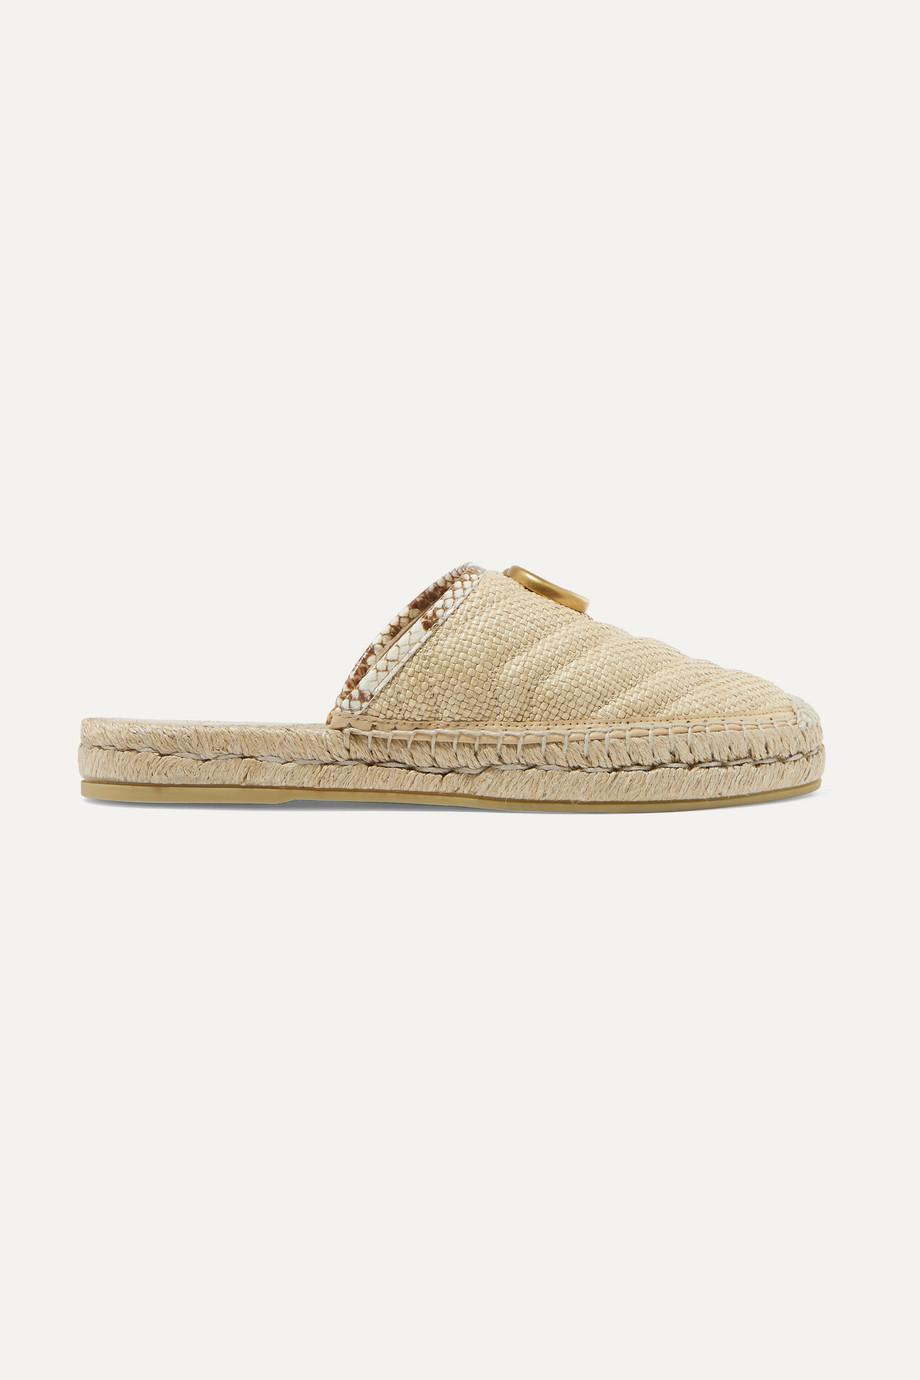 Gucci Pilar elaphe-trimmed raffia espadrille slippers